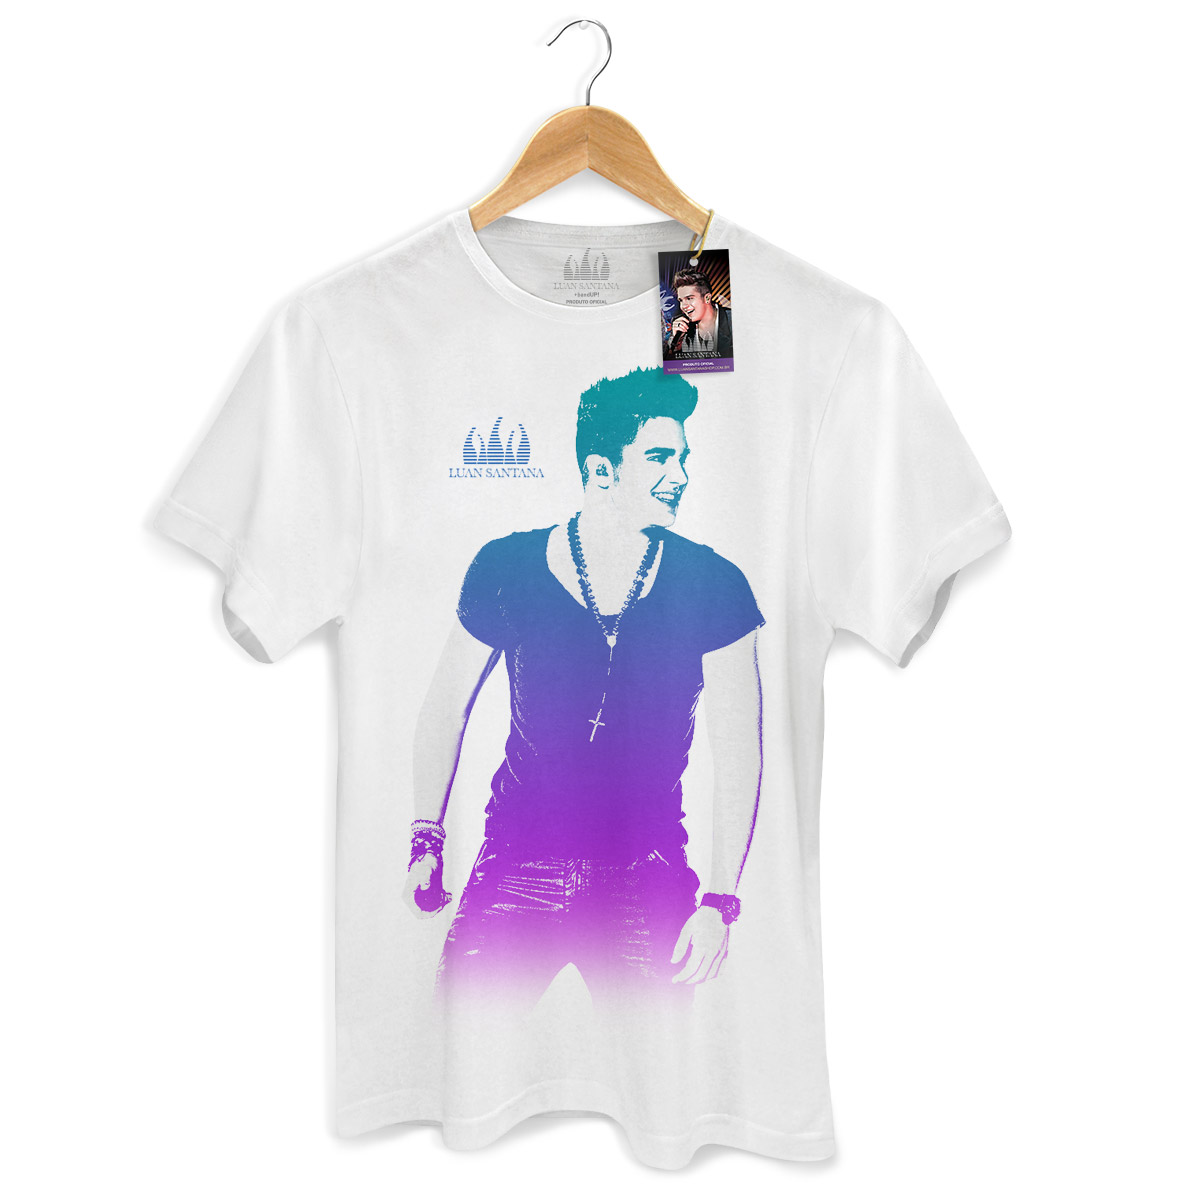 Camiseta Masculina Luan Santana Foto Degradê Branca